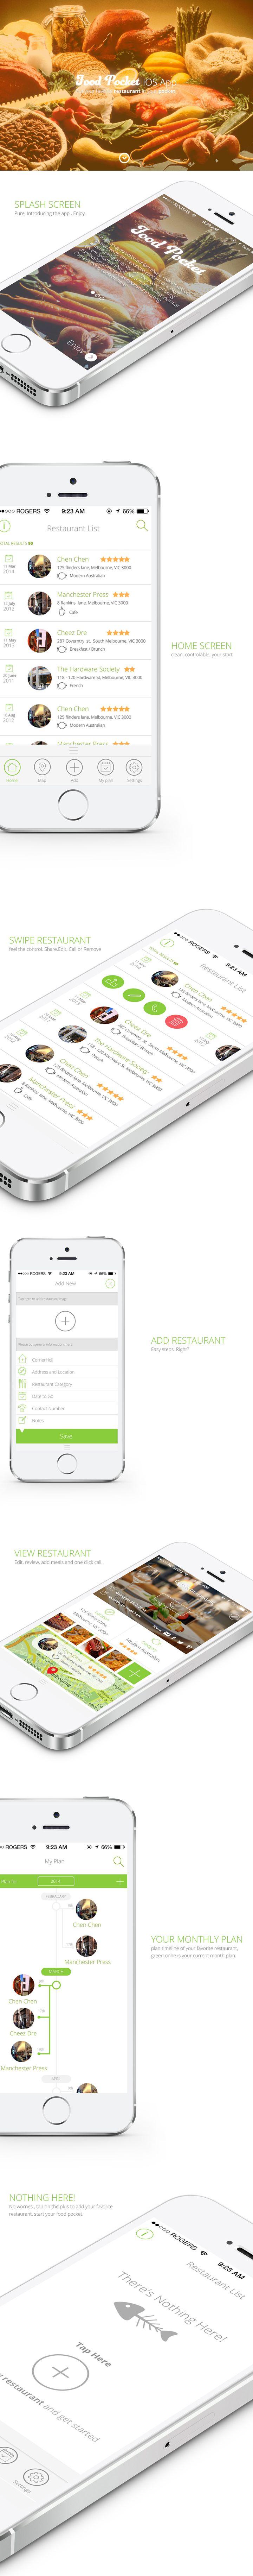 FoodPocket iOS App by nasserui, Restaurant App Template, food theme